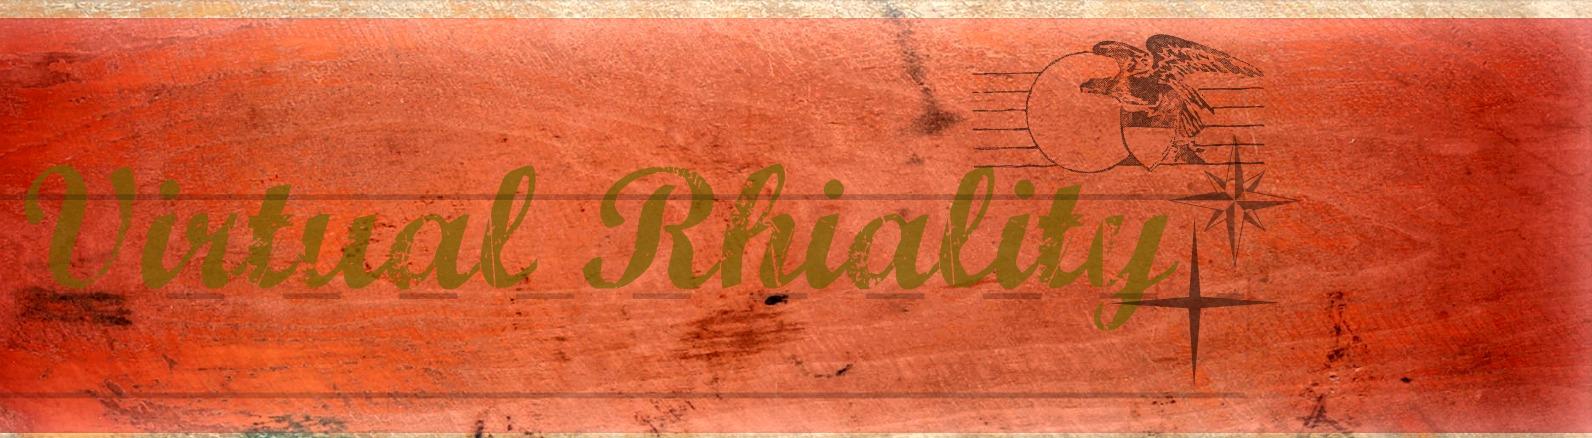 Virtual Rhiality